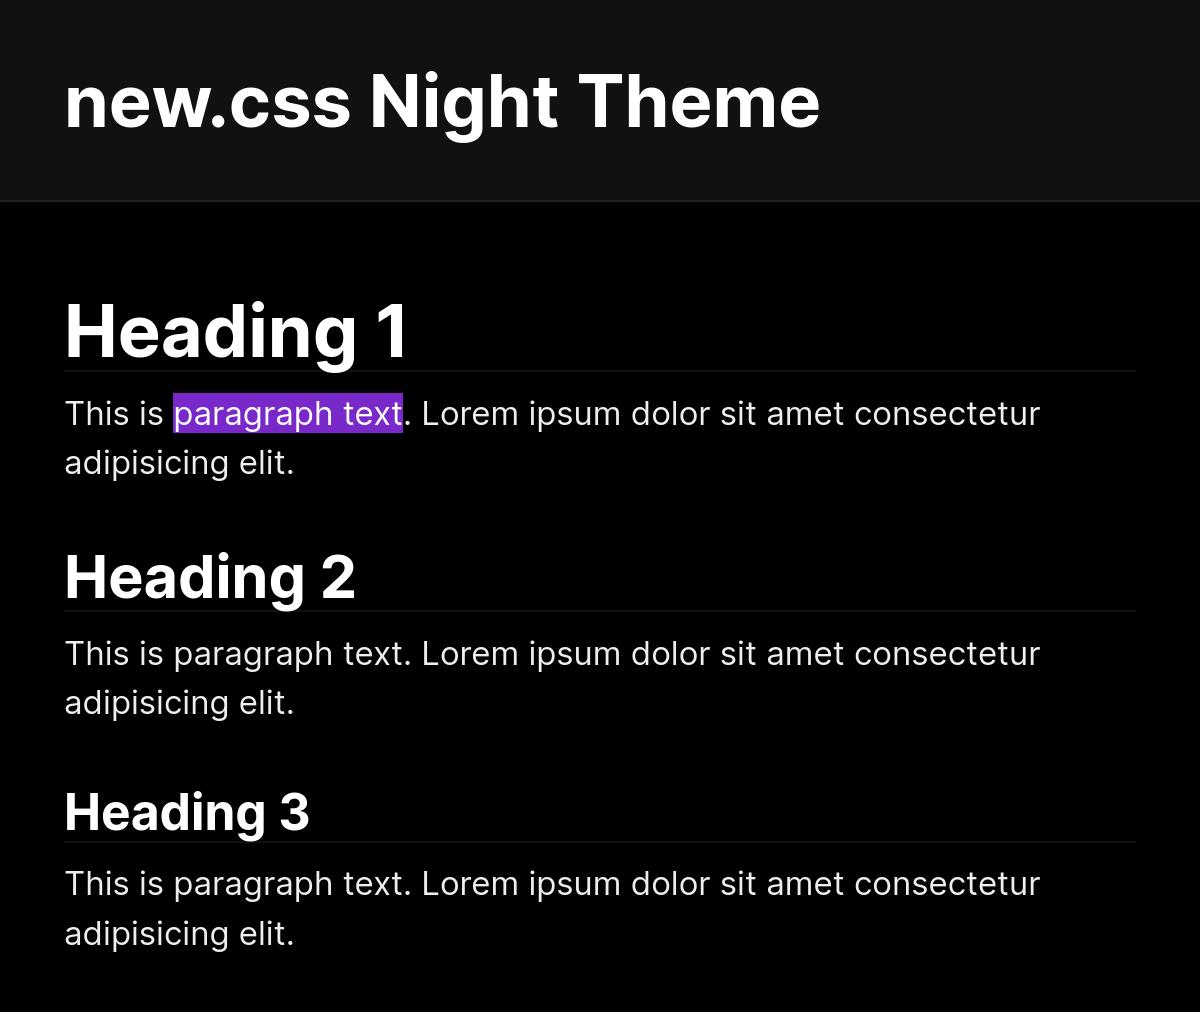 Night theme